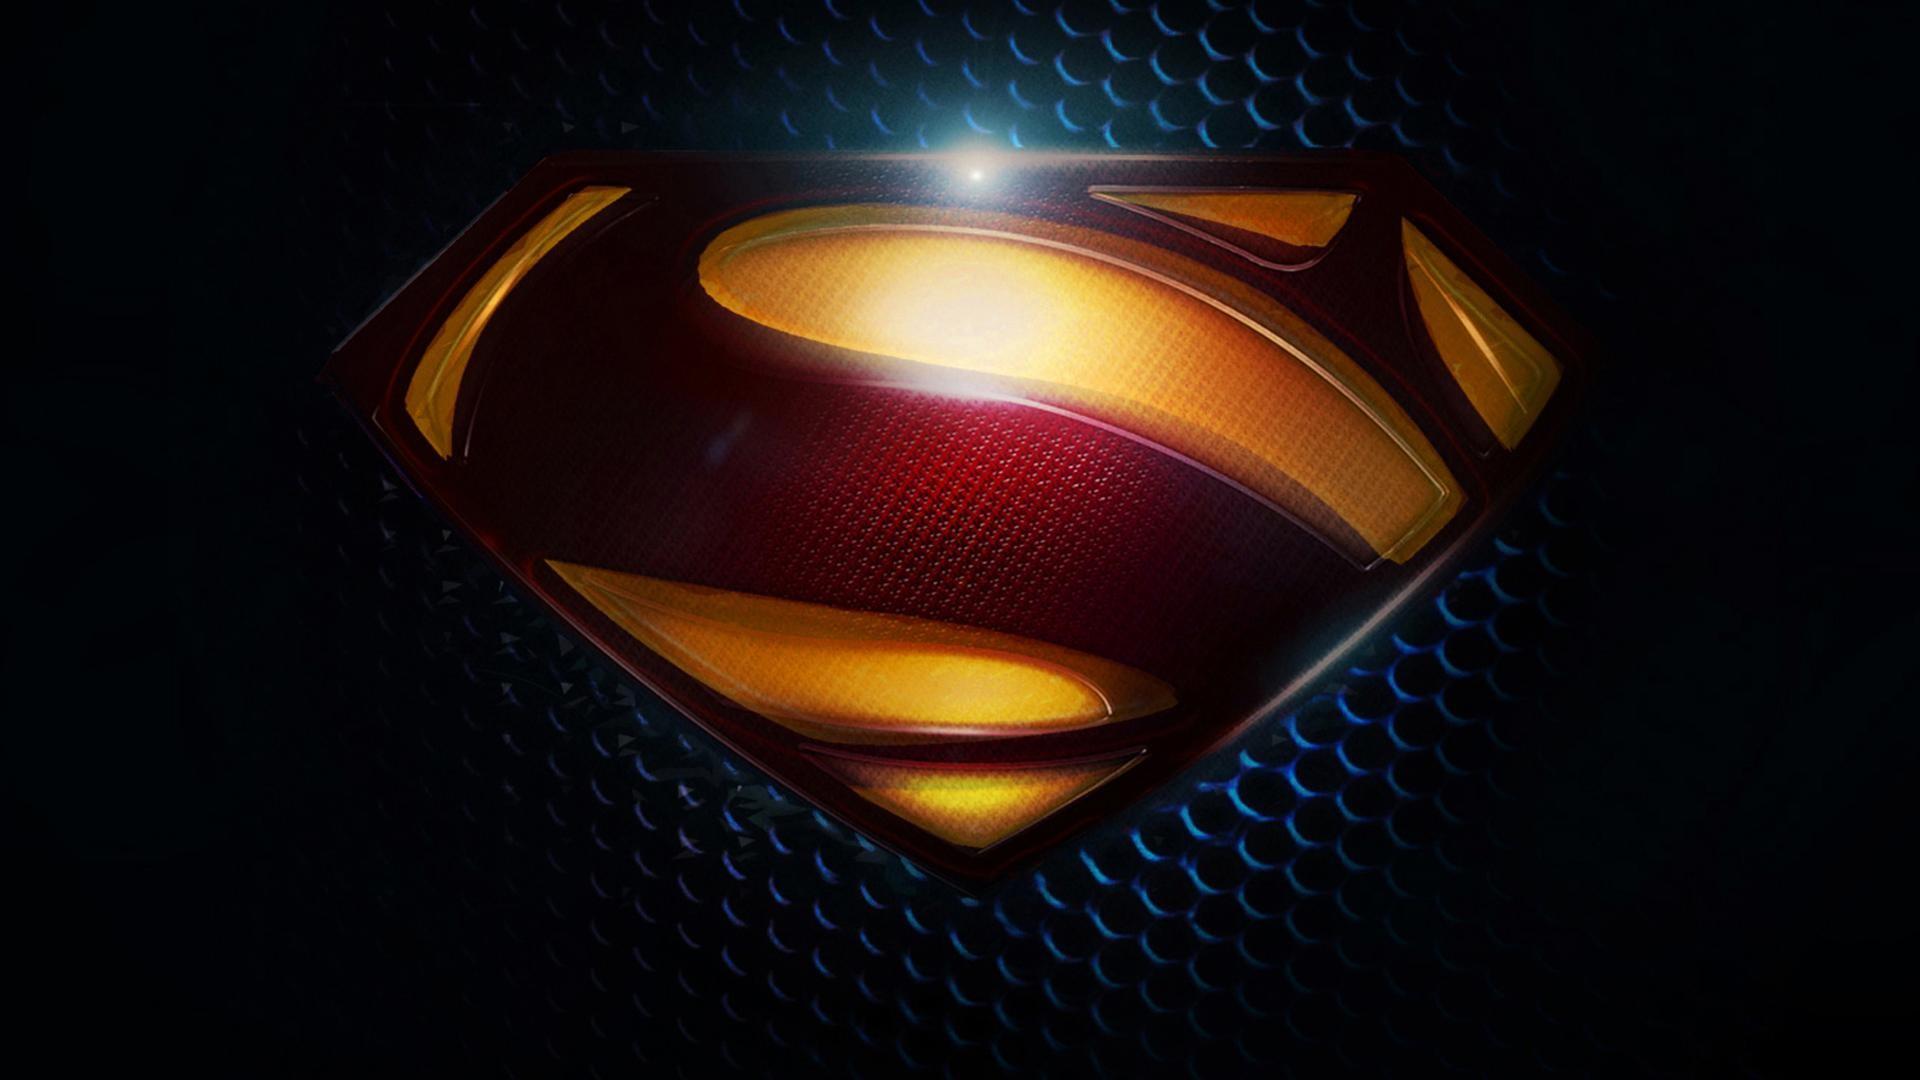 Superman Wallpaper 1920x1080 68 Images